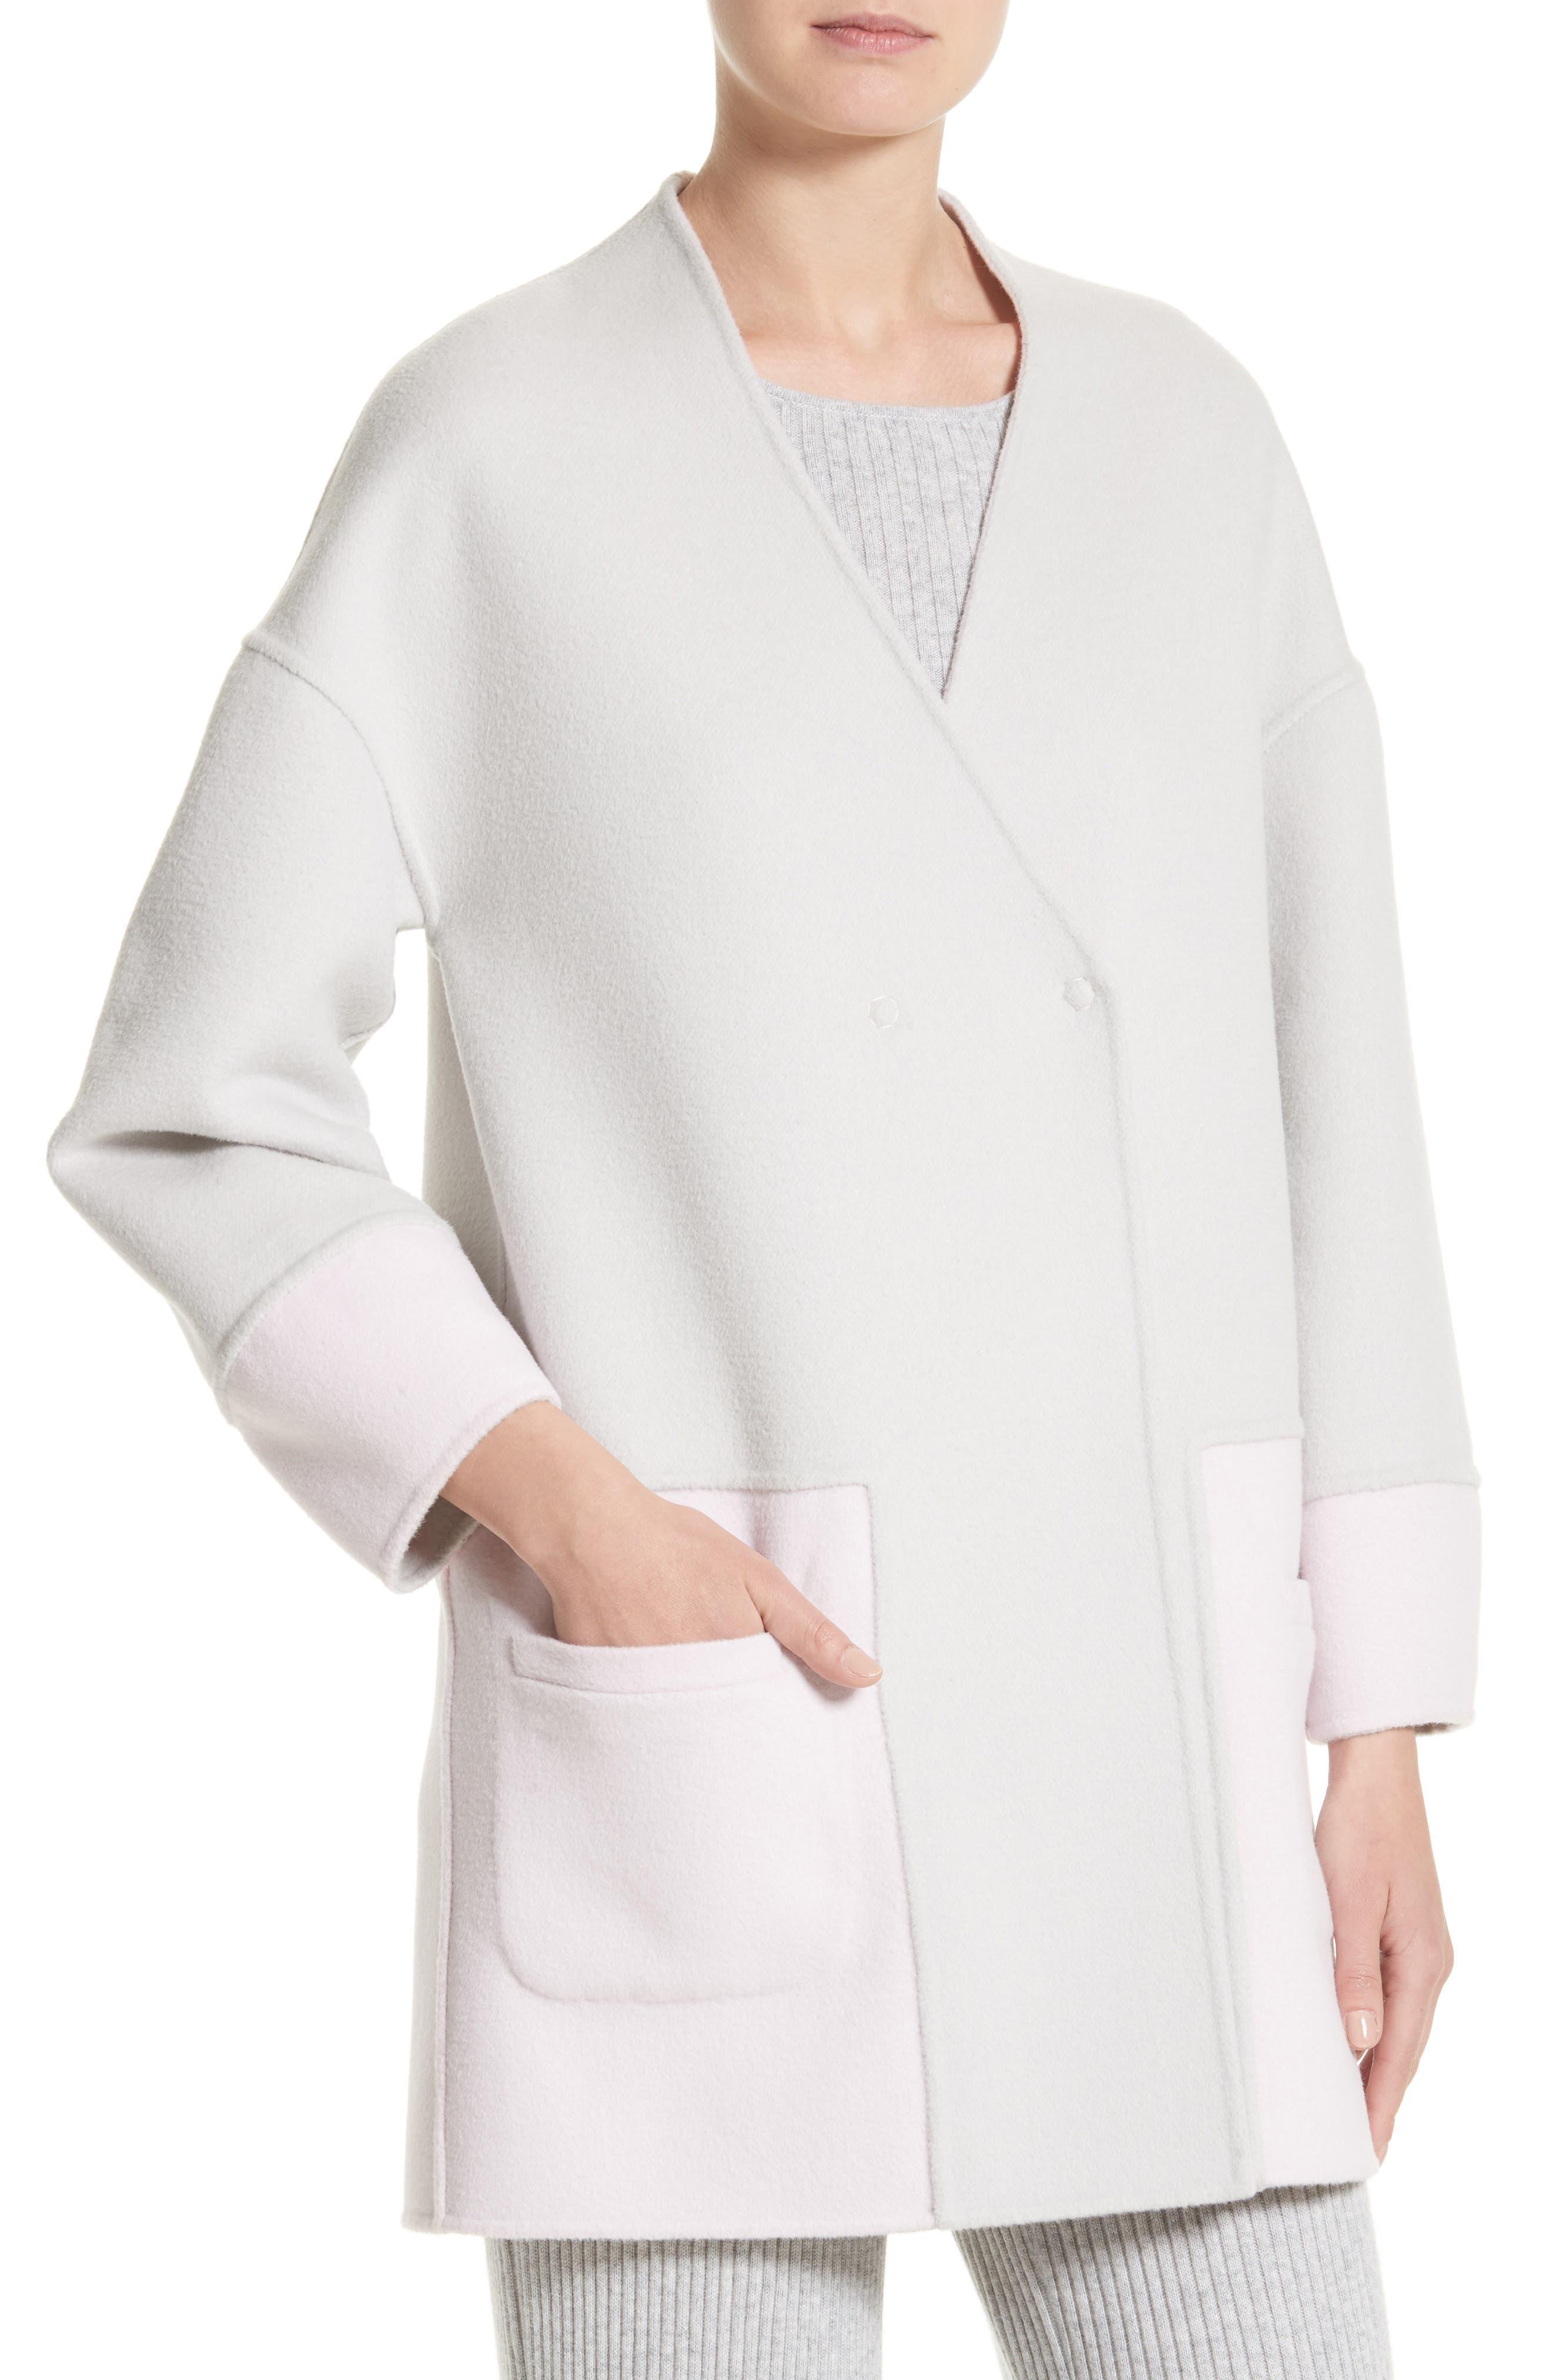 Reversible Wool Blend Cocoon Coat,                             Alternate thumbnail 4, color,                             Petal/ Light Grey Melange